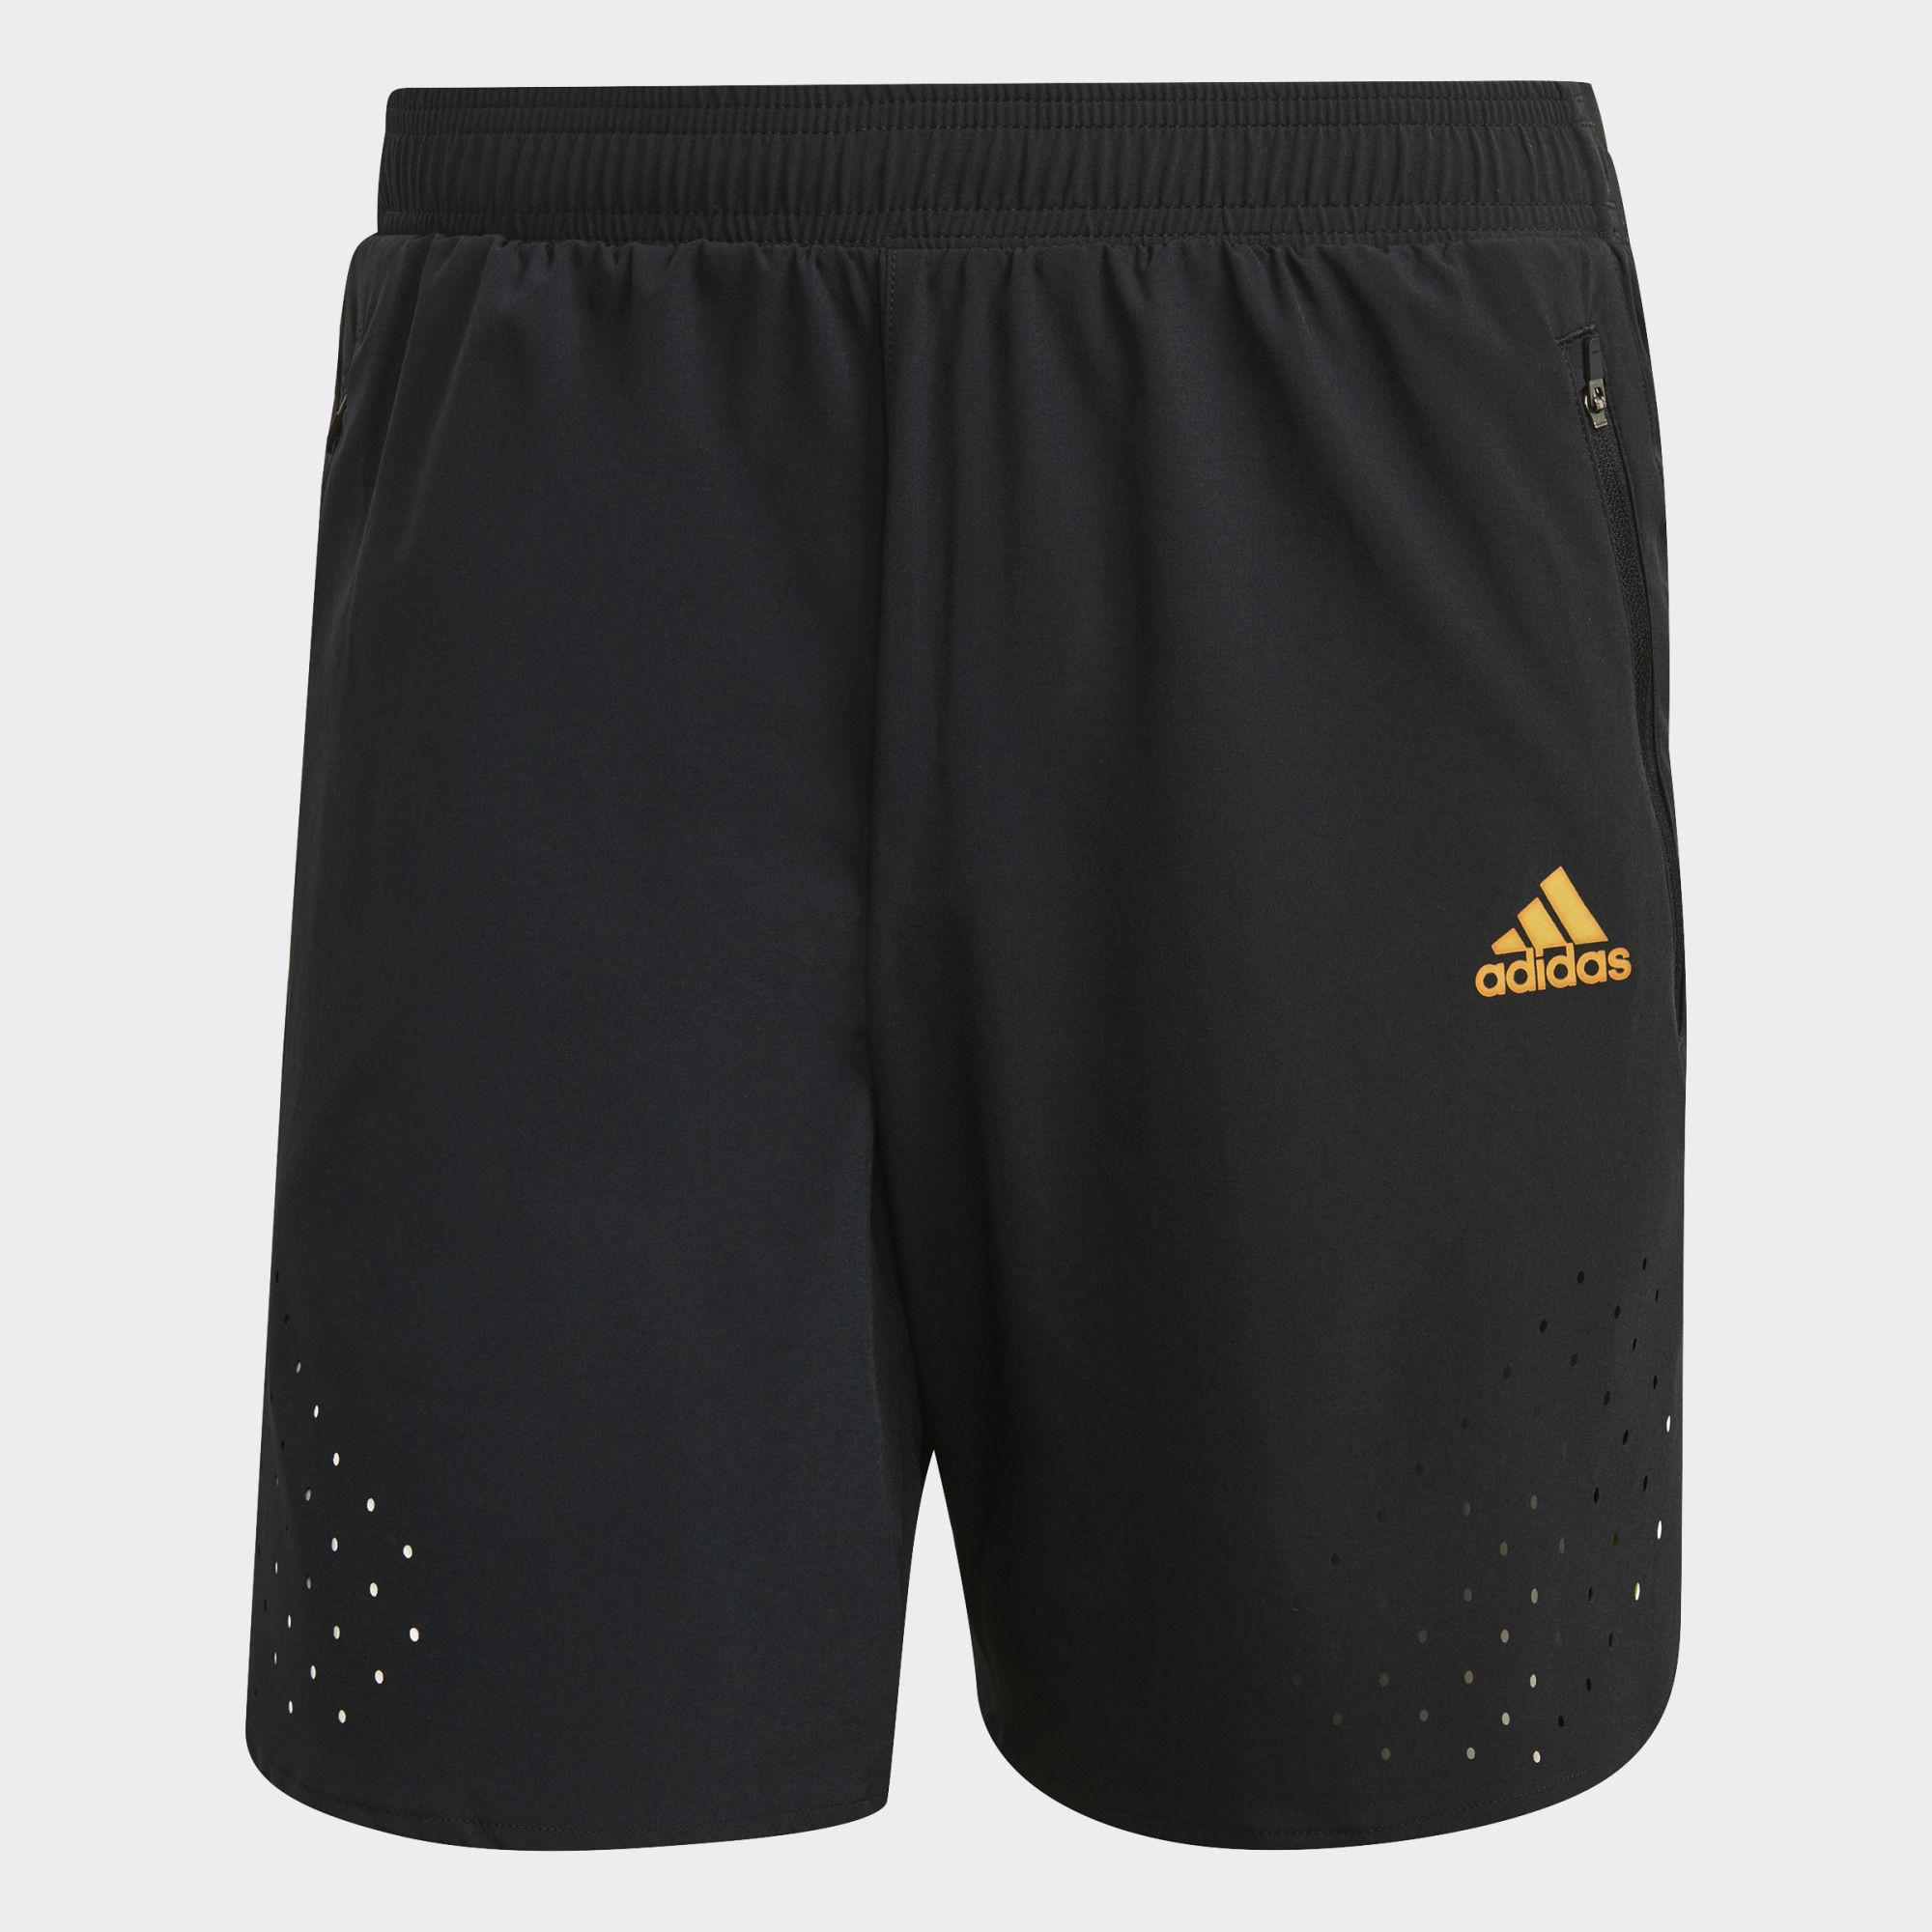 "adidas Ultra Short 7"" (Black Yellow)"